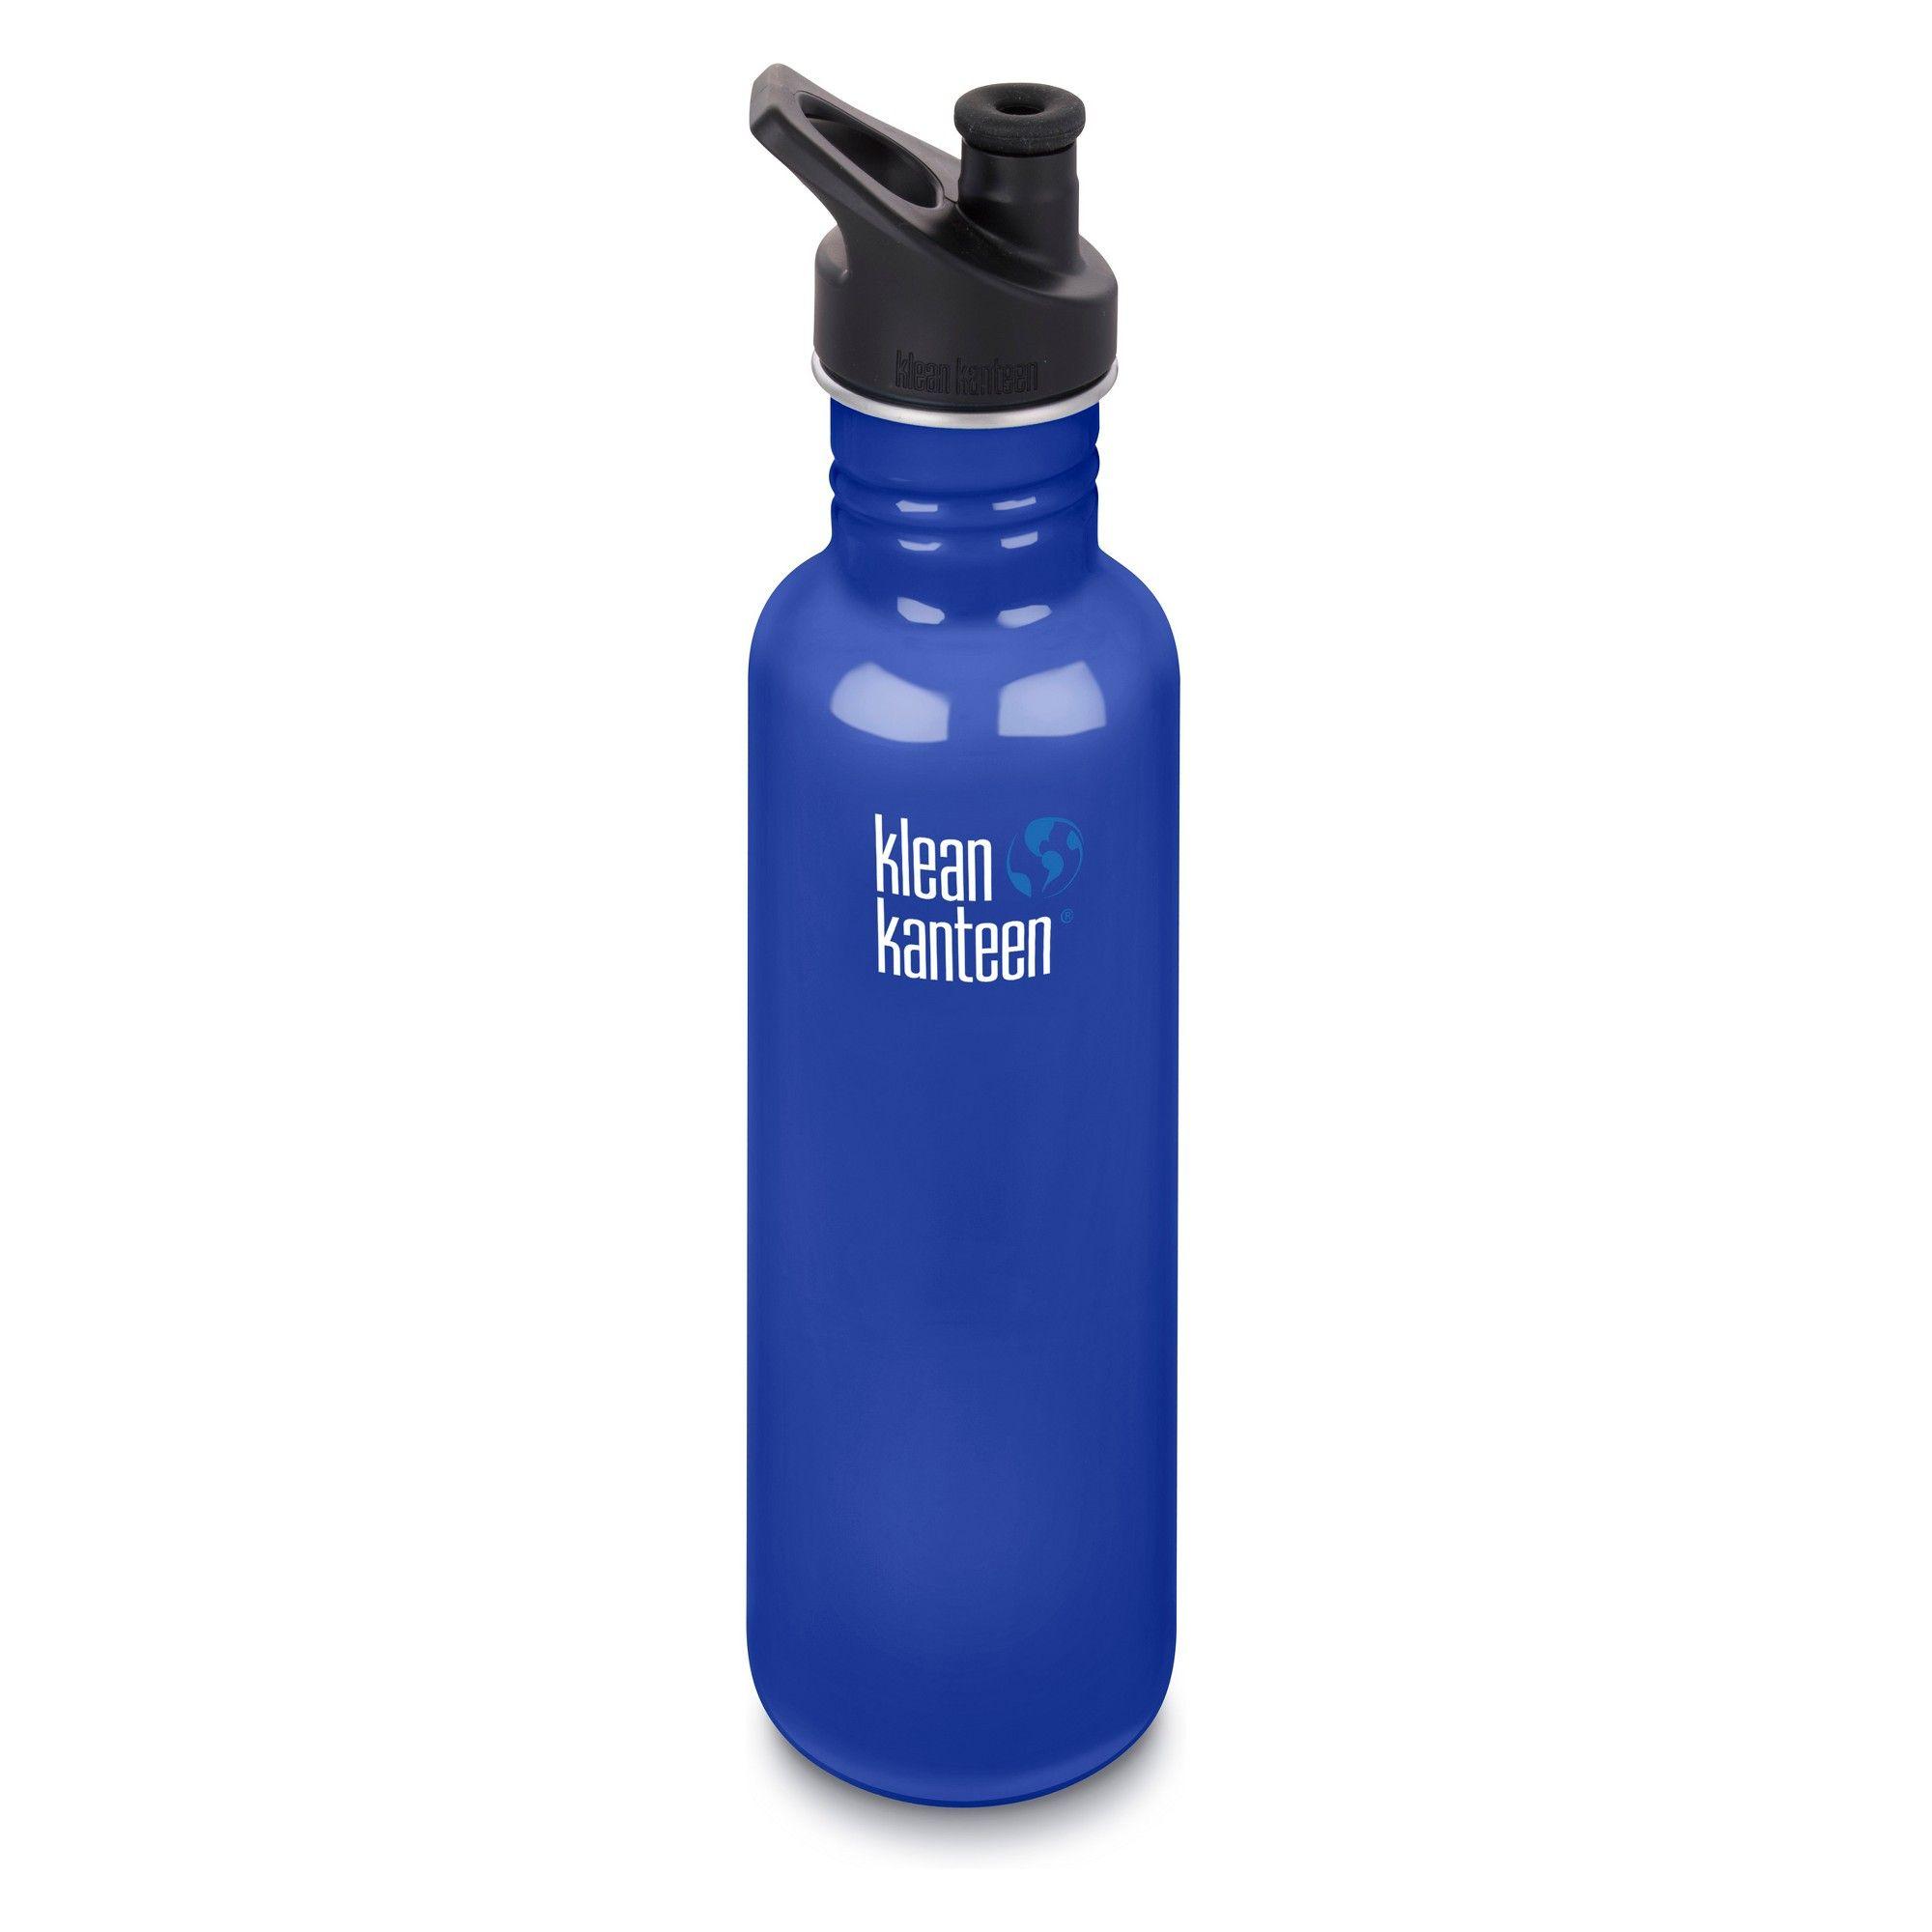 Klean Kanteen Classic Single Wall Stainless Steel Water Bottle with Leak Proof Loop Cap K27WSSL-BS-Parent